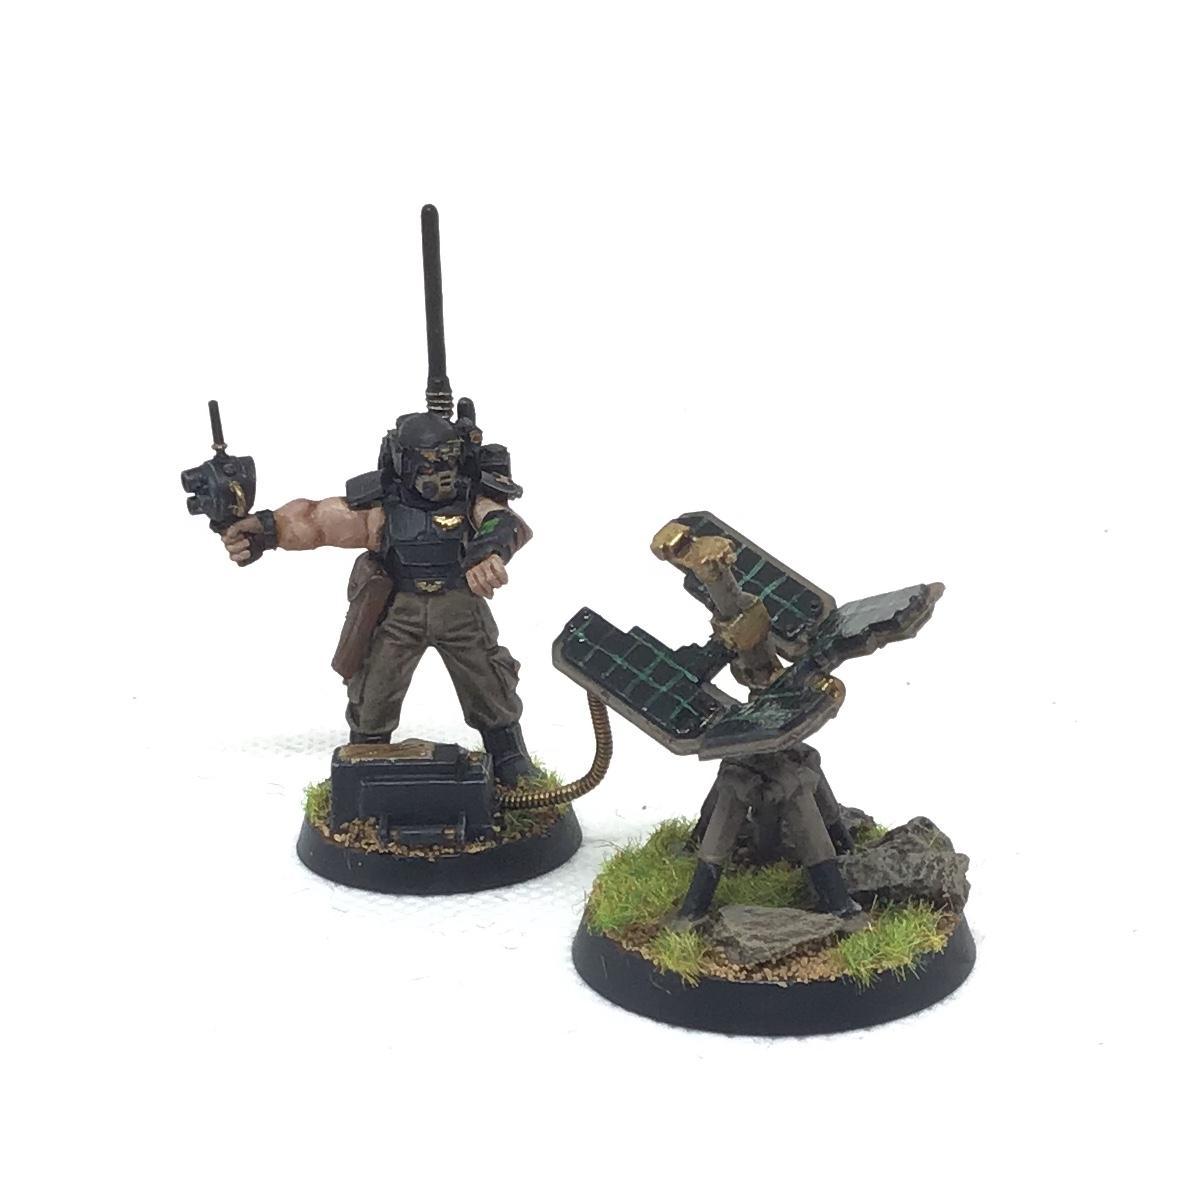 Astra Militarum, Communications, Conversion, Games Workshop, Guard, Imperial Guard, Imperium, Kitbash, Militarum, Uplink, Vox, Warhammer 40,000